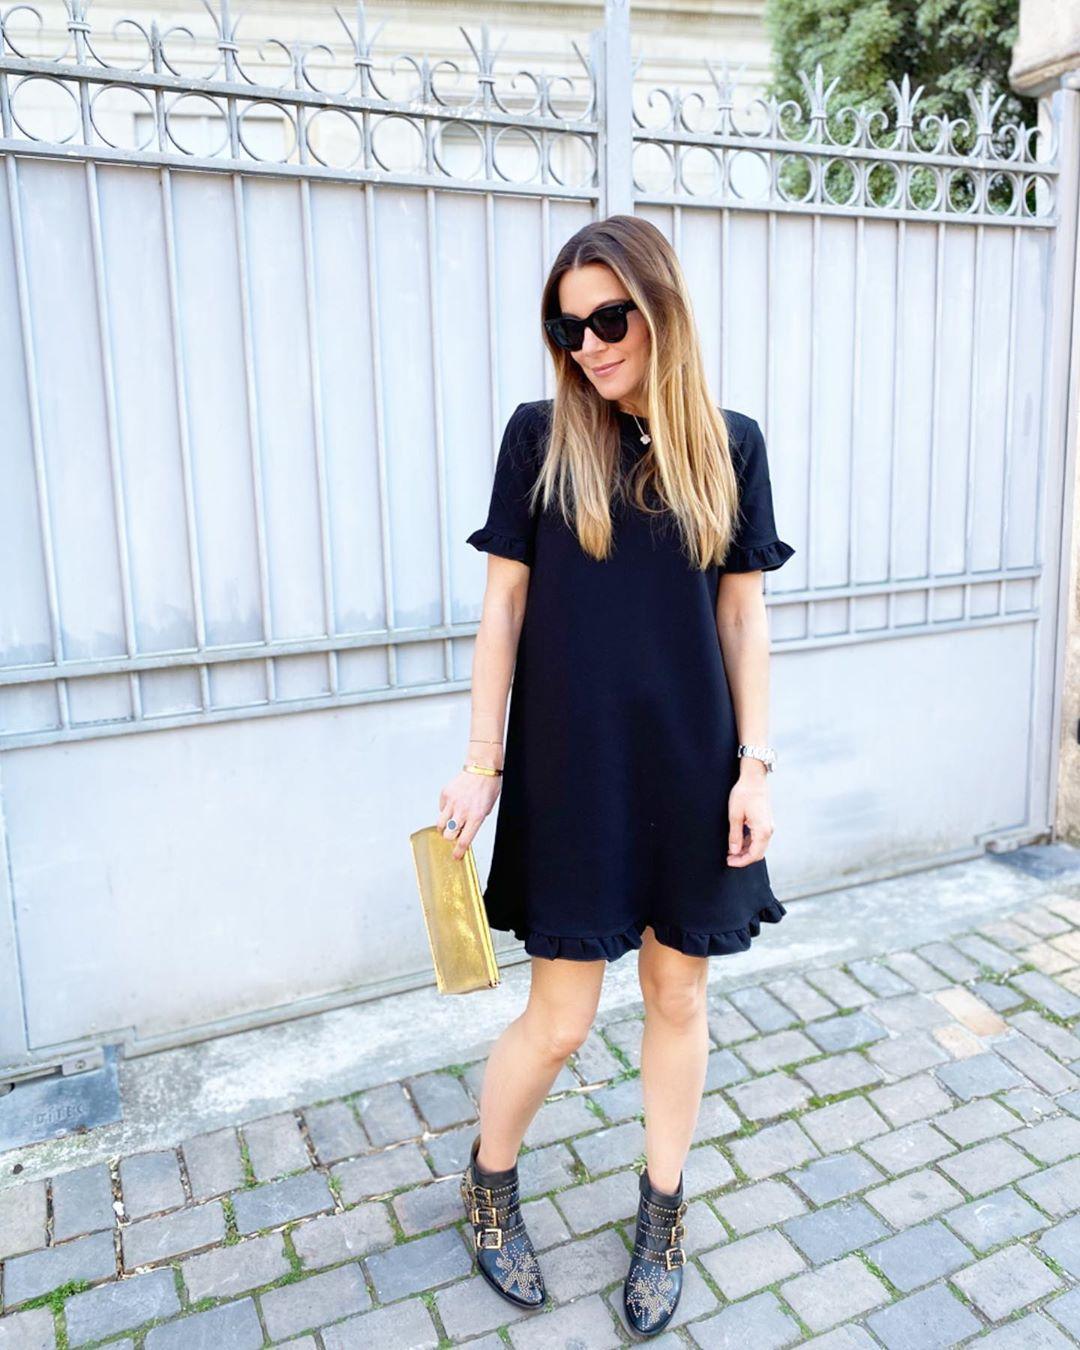 Black Mini Dress Black Studded Ankle Boots Gold Clutch Black Sunglasses Summer Casual Date Outfit 2020 Black Boots Outfit Boots Outfit Ankle Outfits [ 1350 x 1080 Pixel ]